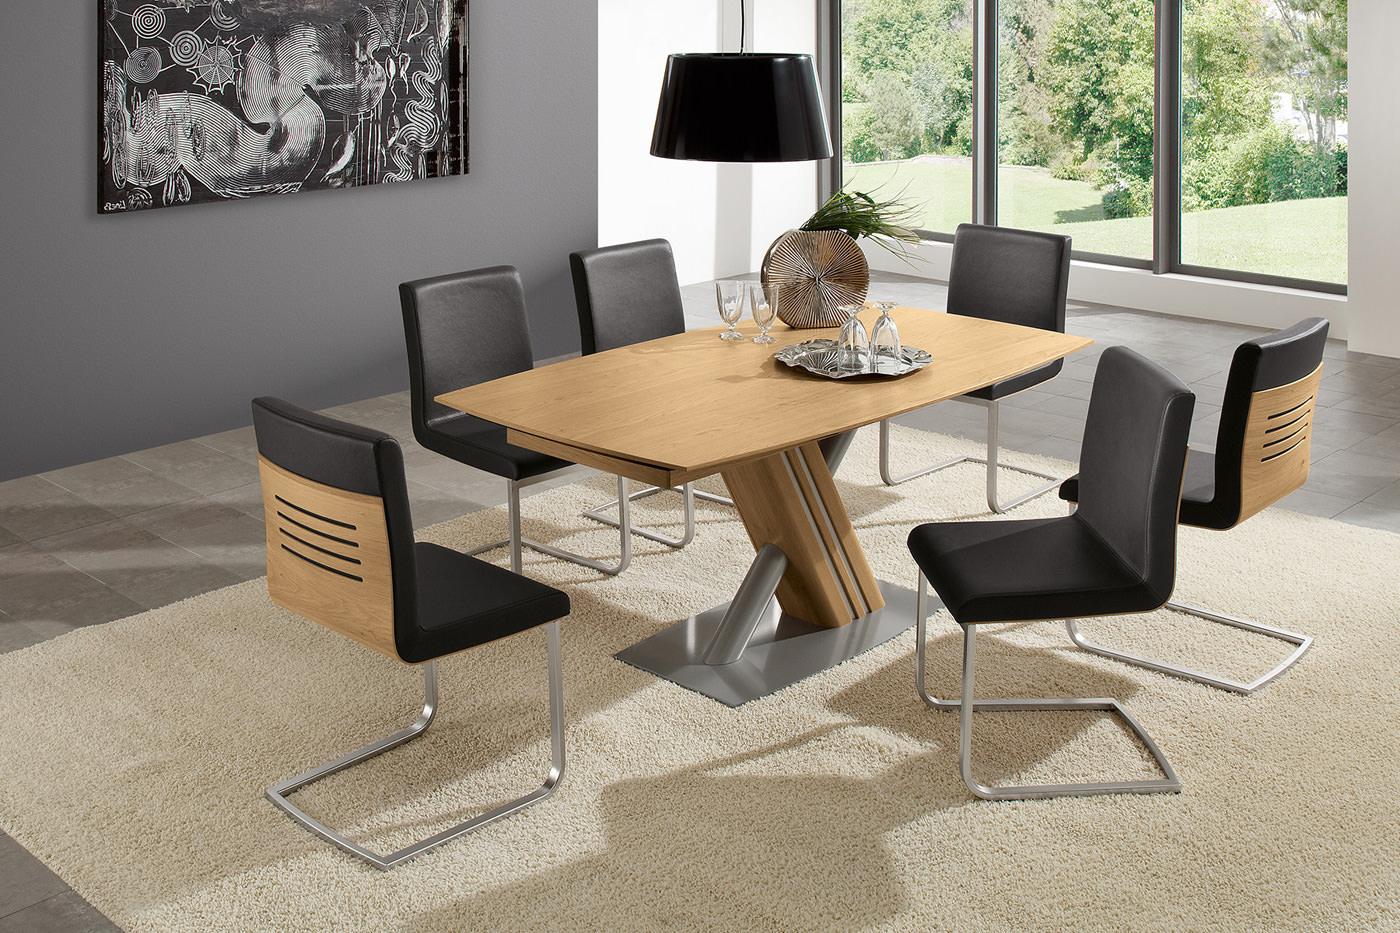 raumgestaltung schlafzimmer modern tags raumgestaltung schlafzimmer modern deckenpaneele wei. Black Bedroom Furniture Sets. Home Design Ideas